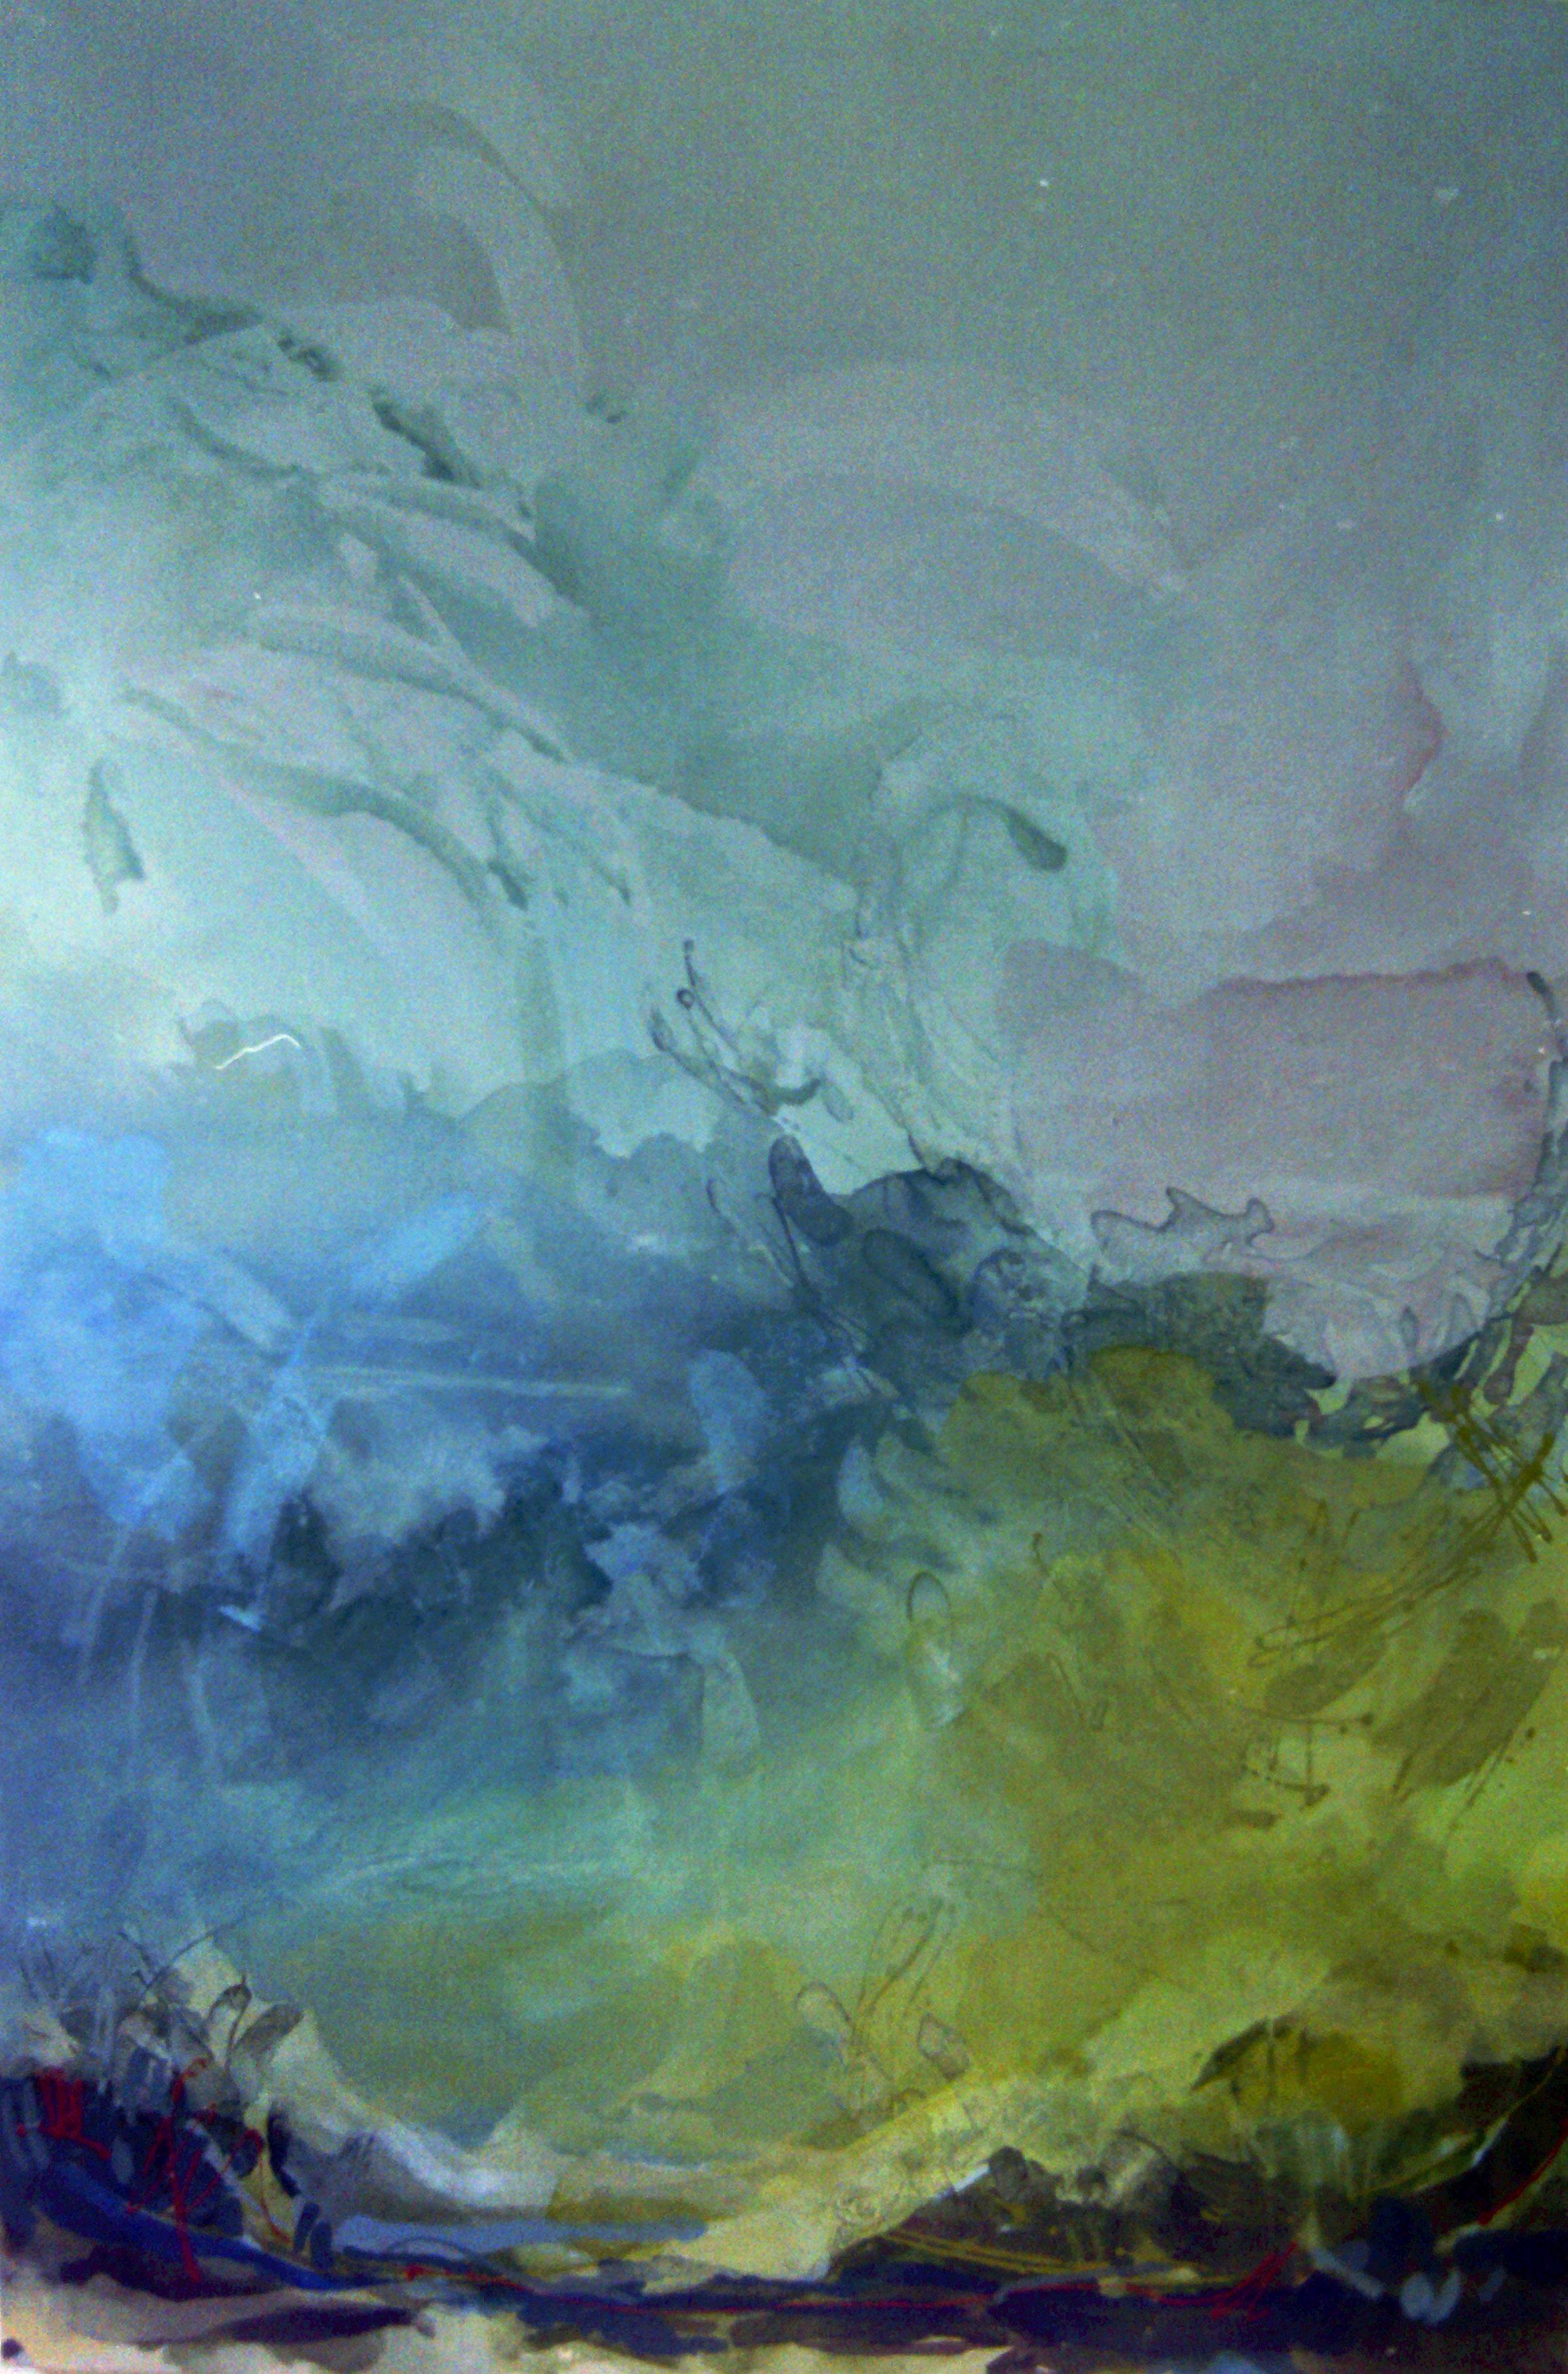 seascape 8, acrylic on canvas, 1998, 40 x 60cm sold